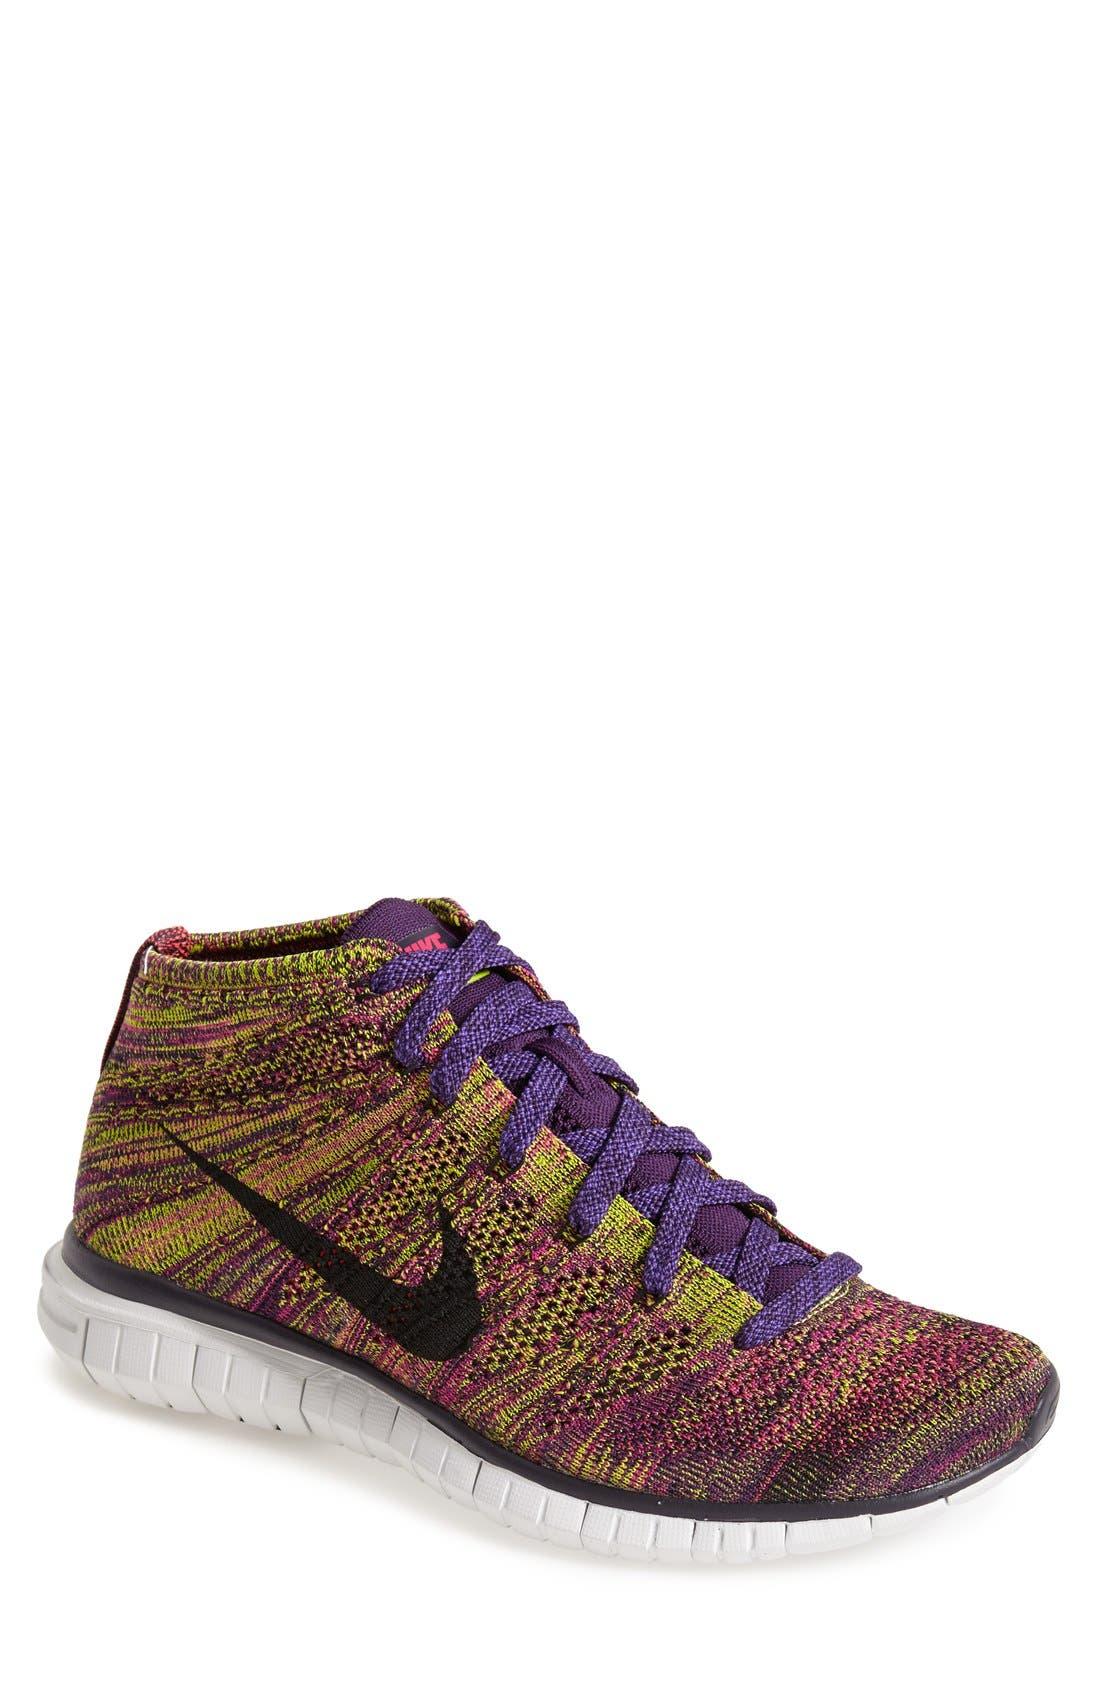 Alternate Image 1 Selected - Nike 'Free Flyknit Chukka' Sneaker (Men)